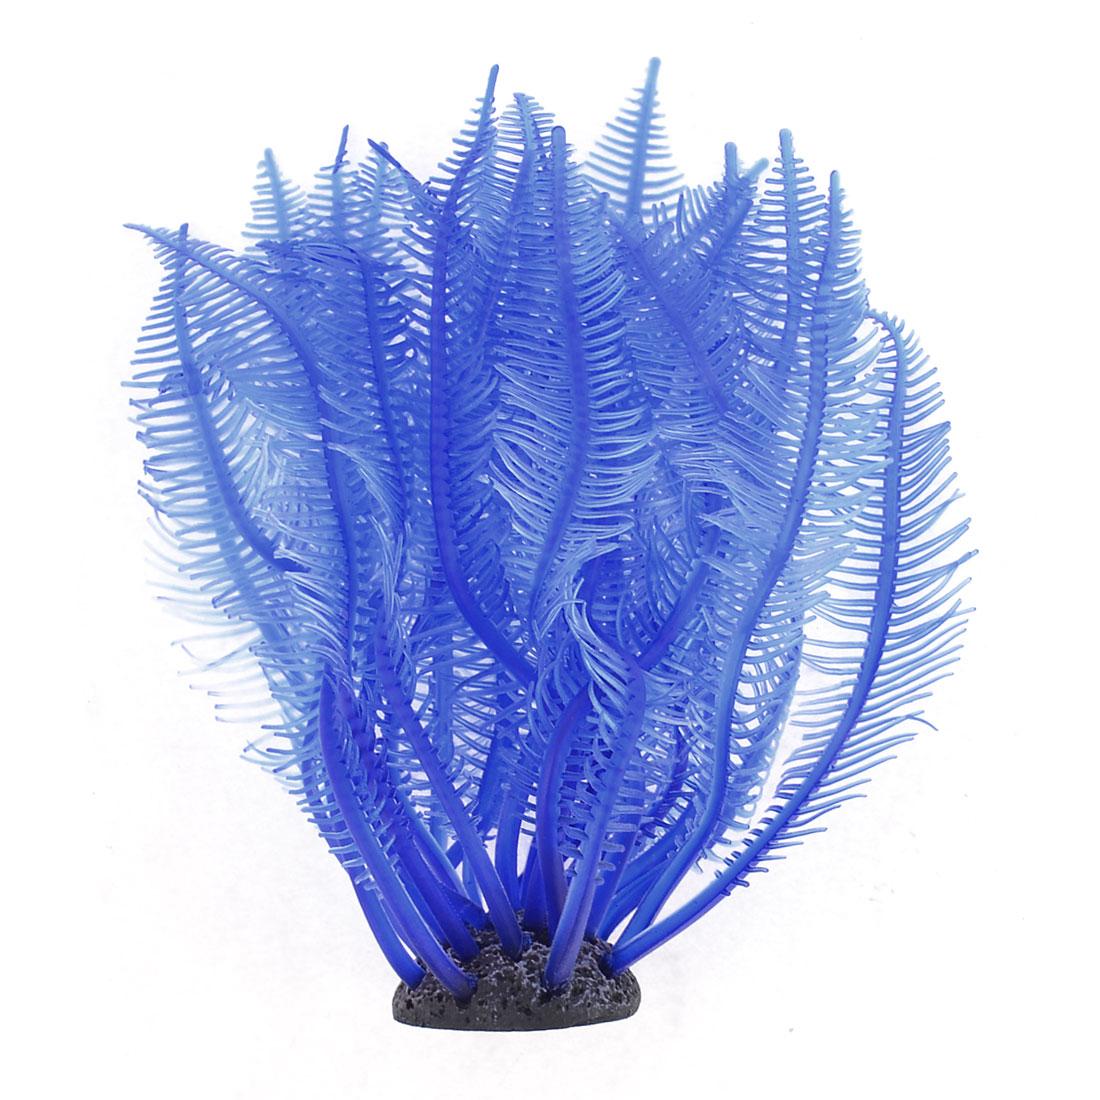 Aquarium Fish Tank Decor Plants Soft Plastic Blue Sea Anemone